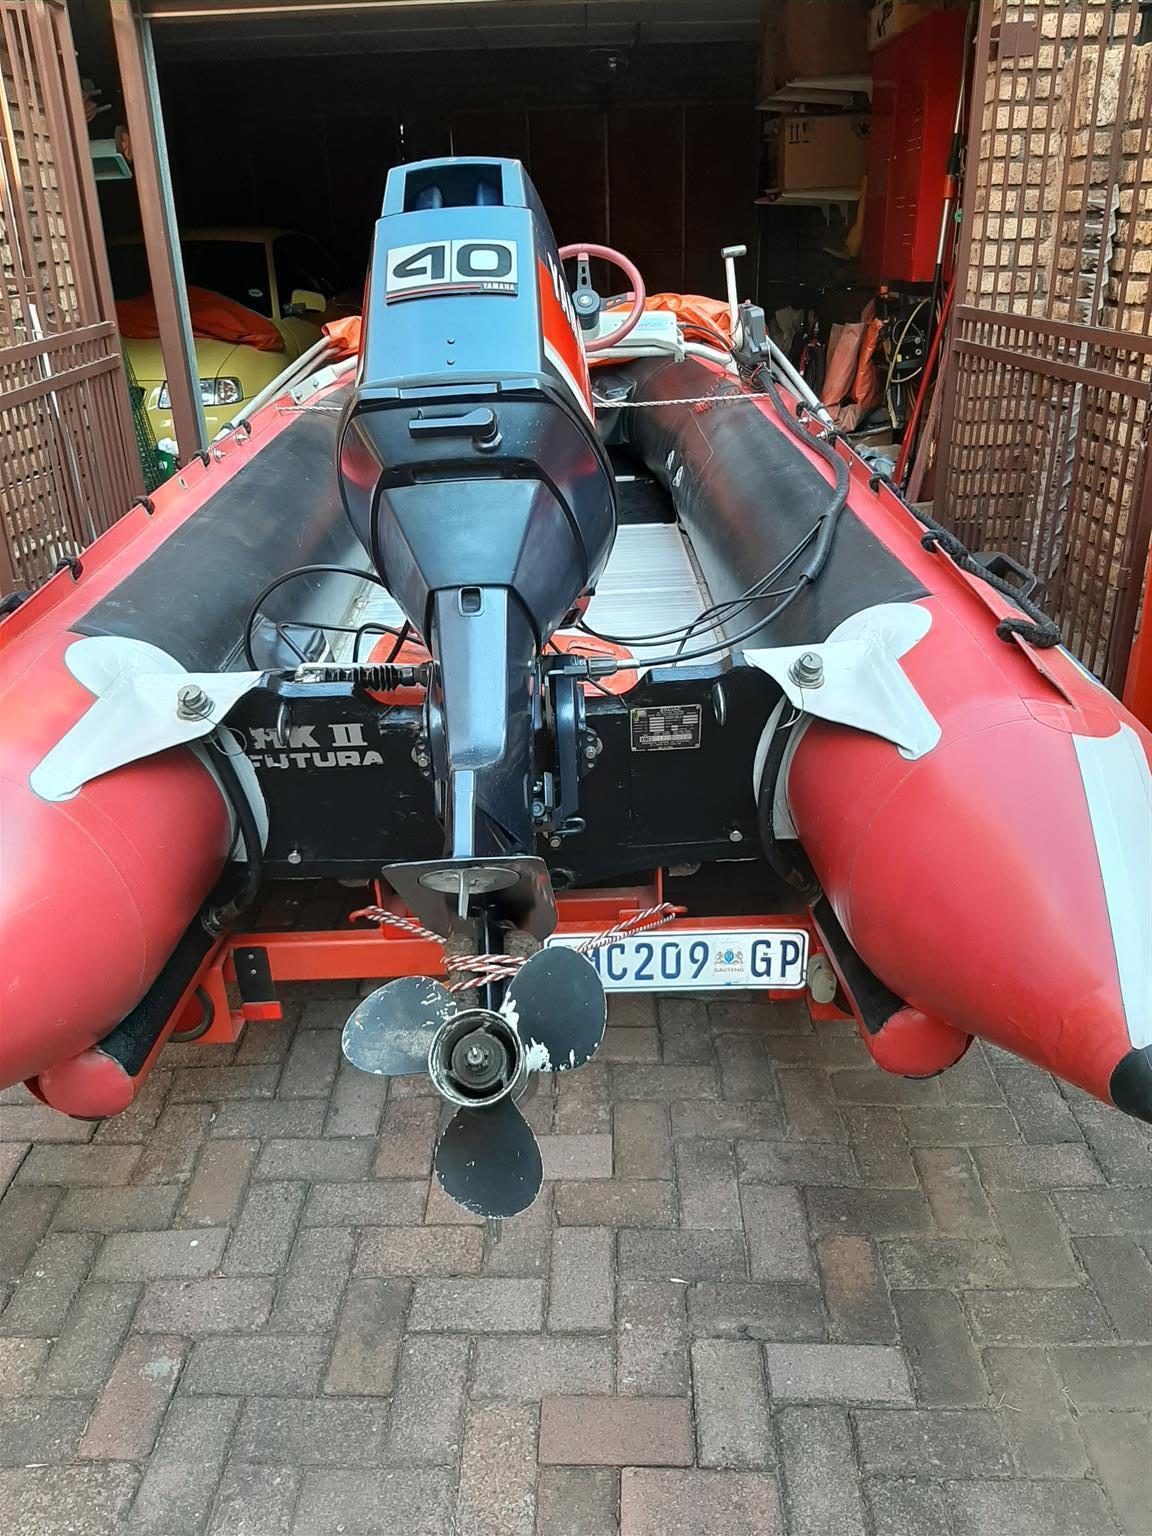 Inflatable Boat Zodiac MkII Futura